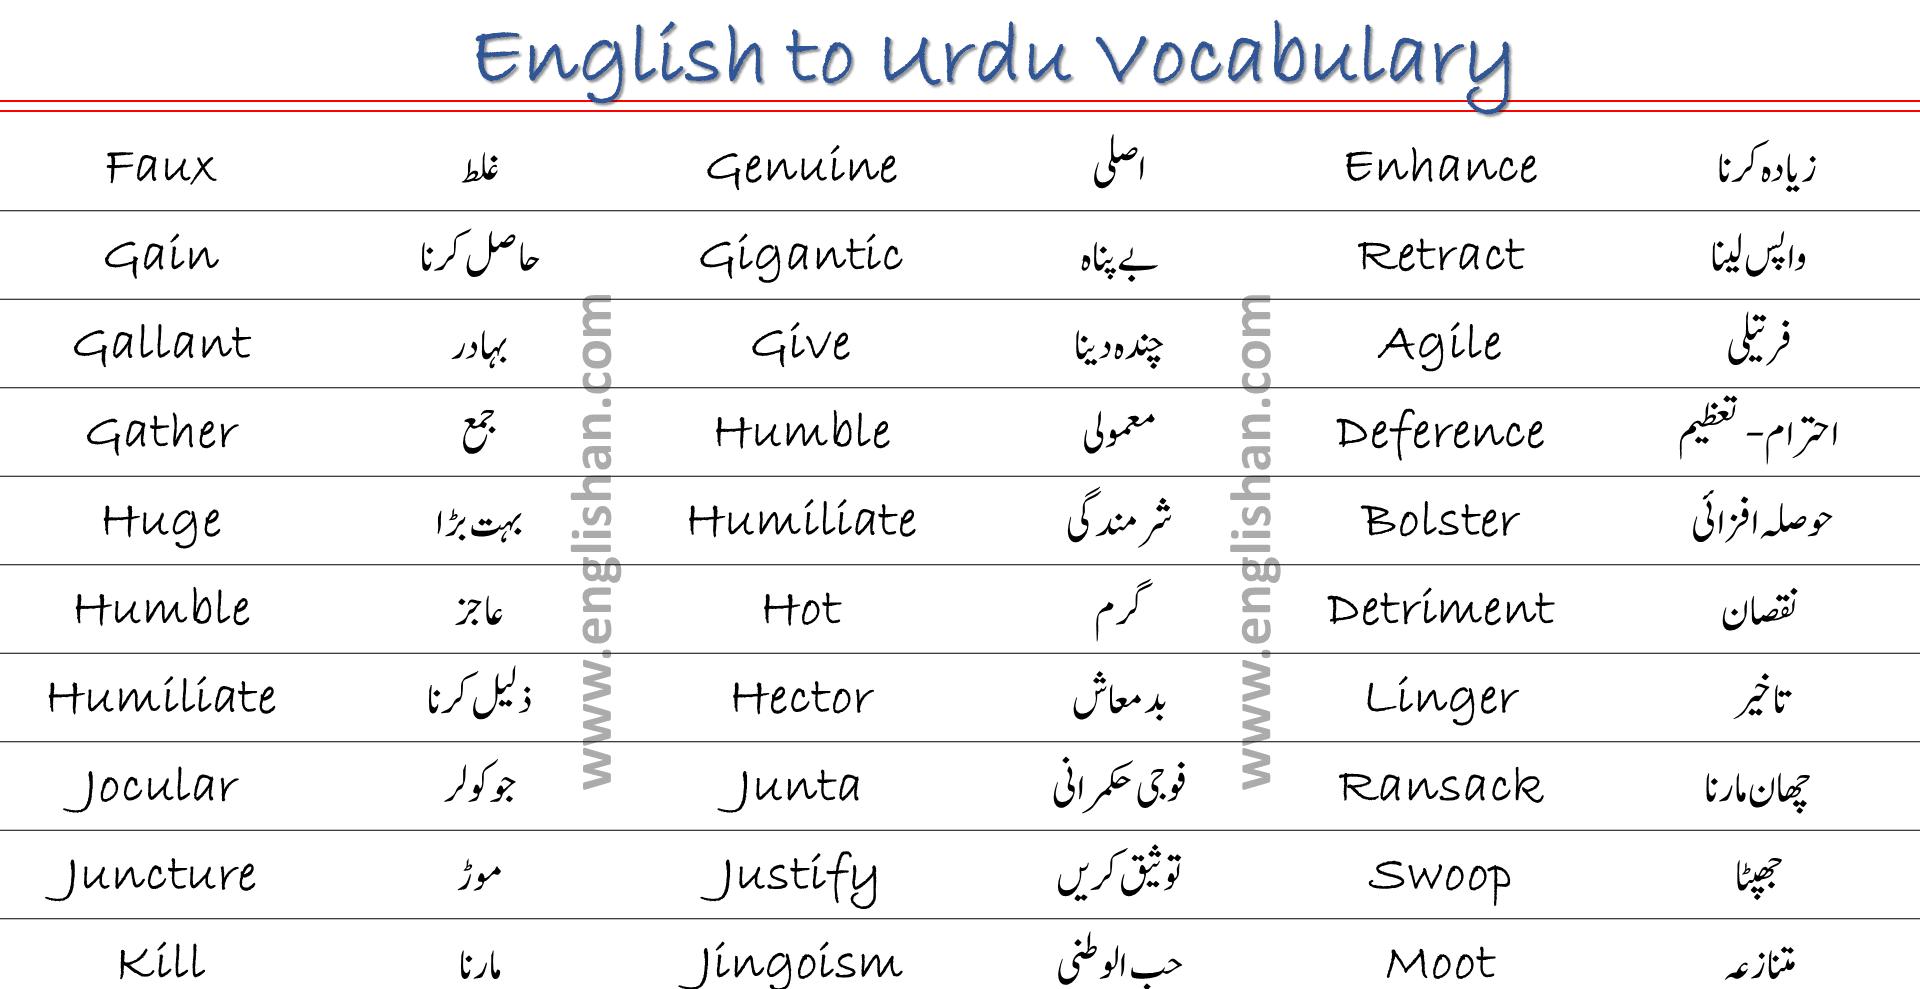 100 English to Urdu Vocabulary List